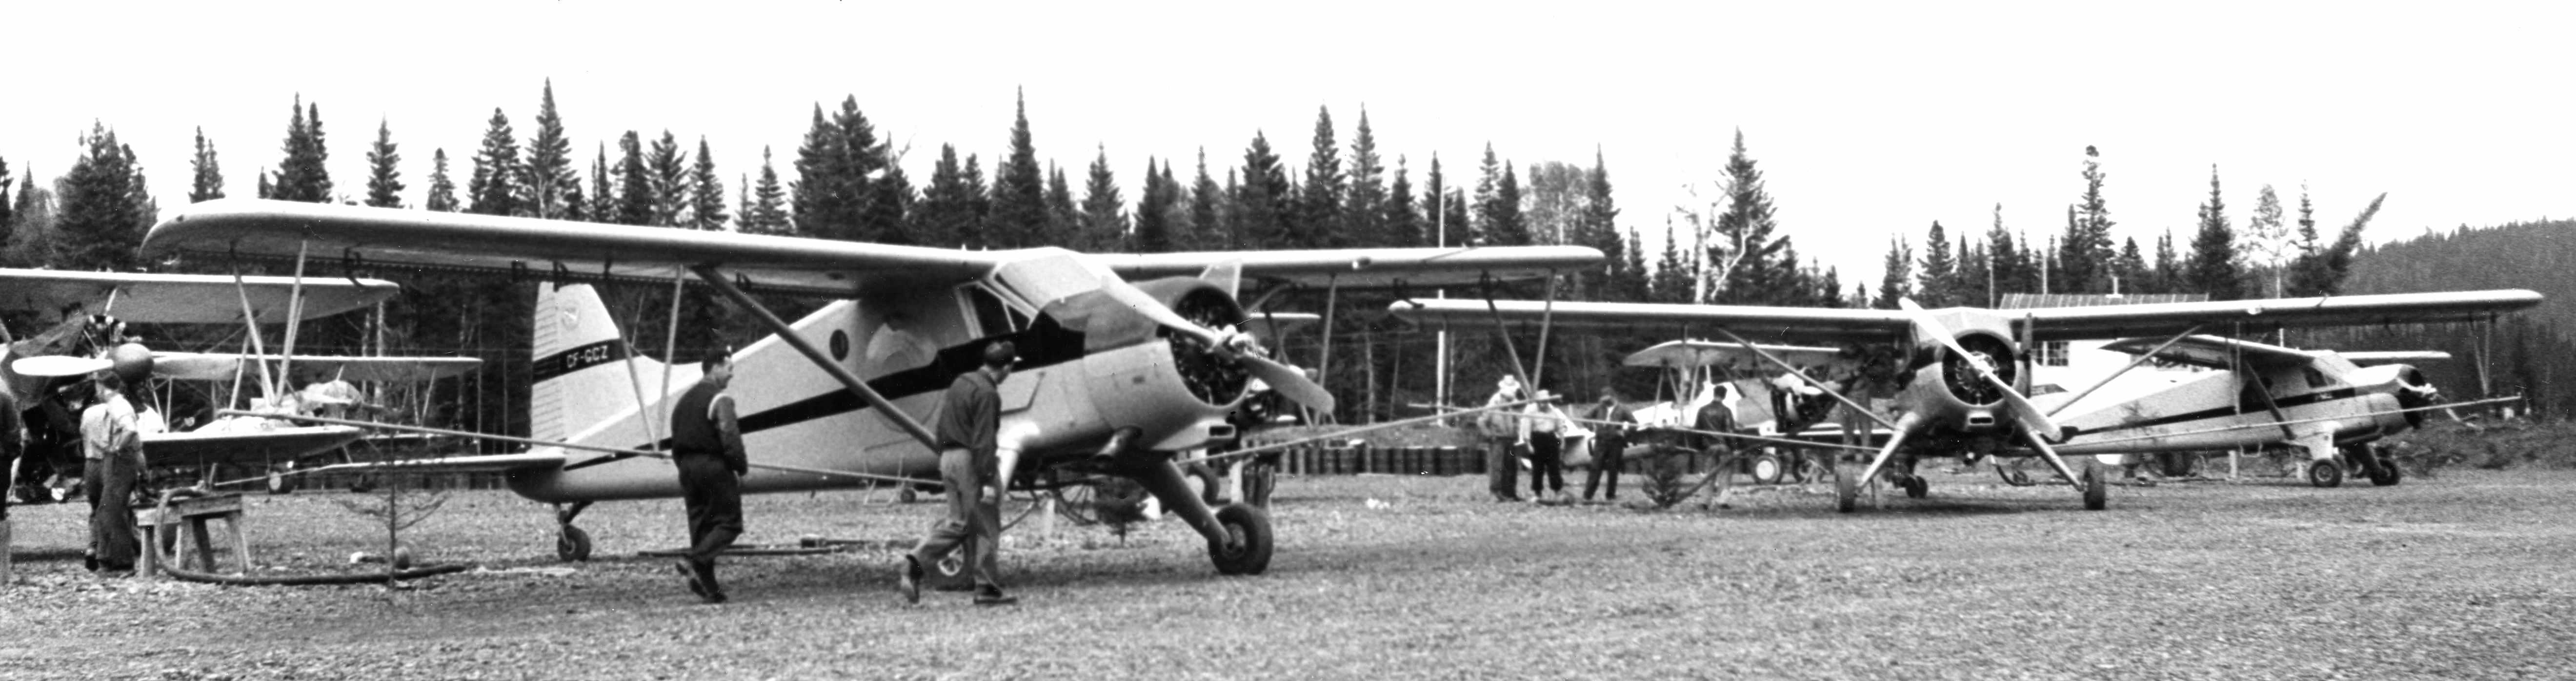 BLOG 19 HALFORD DHC Files 2-2019 Budworm spray Beavers New Brunswick 1950s CF-GCZ